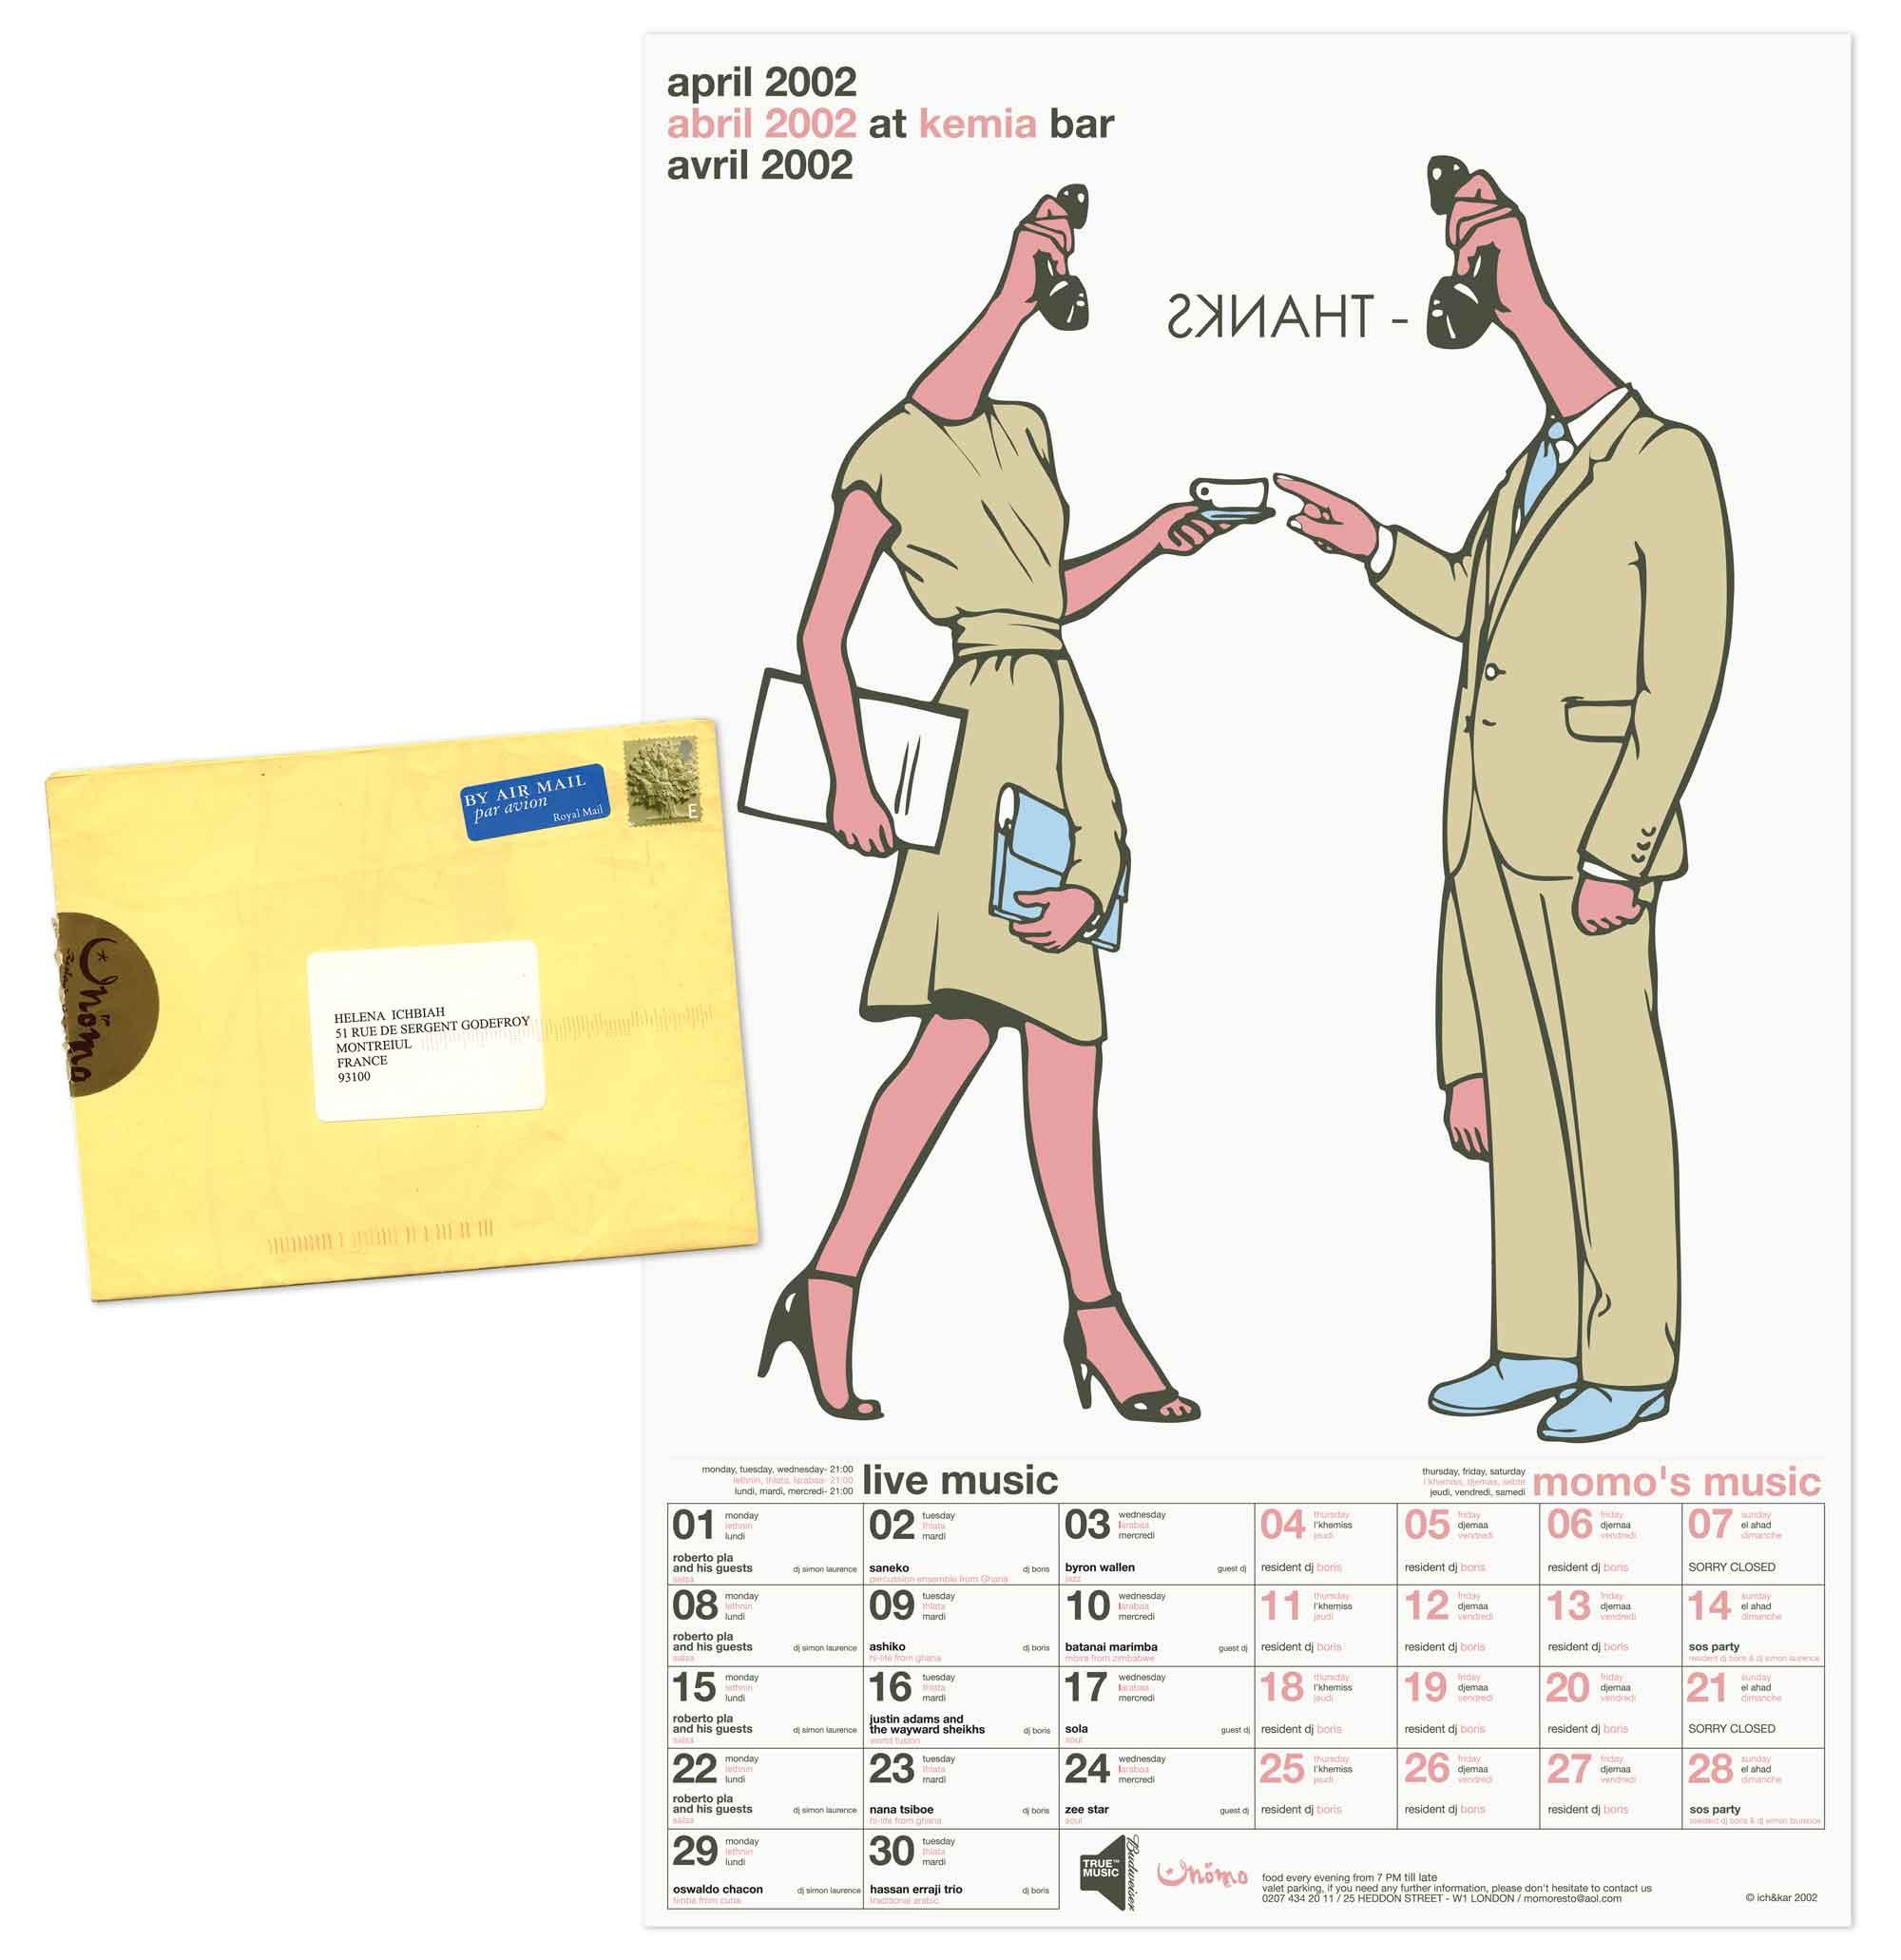 poster Momo avril 2002 comics dédicace Henya Mekki par Ich&Kar